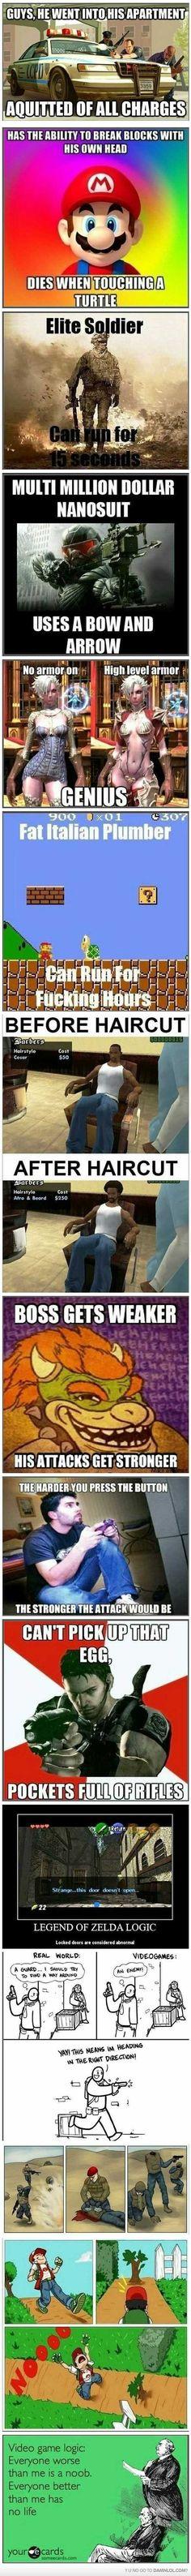 Bahahahahaha!!!!!! #GamerHumour